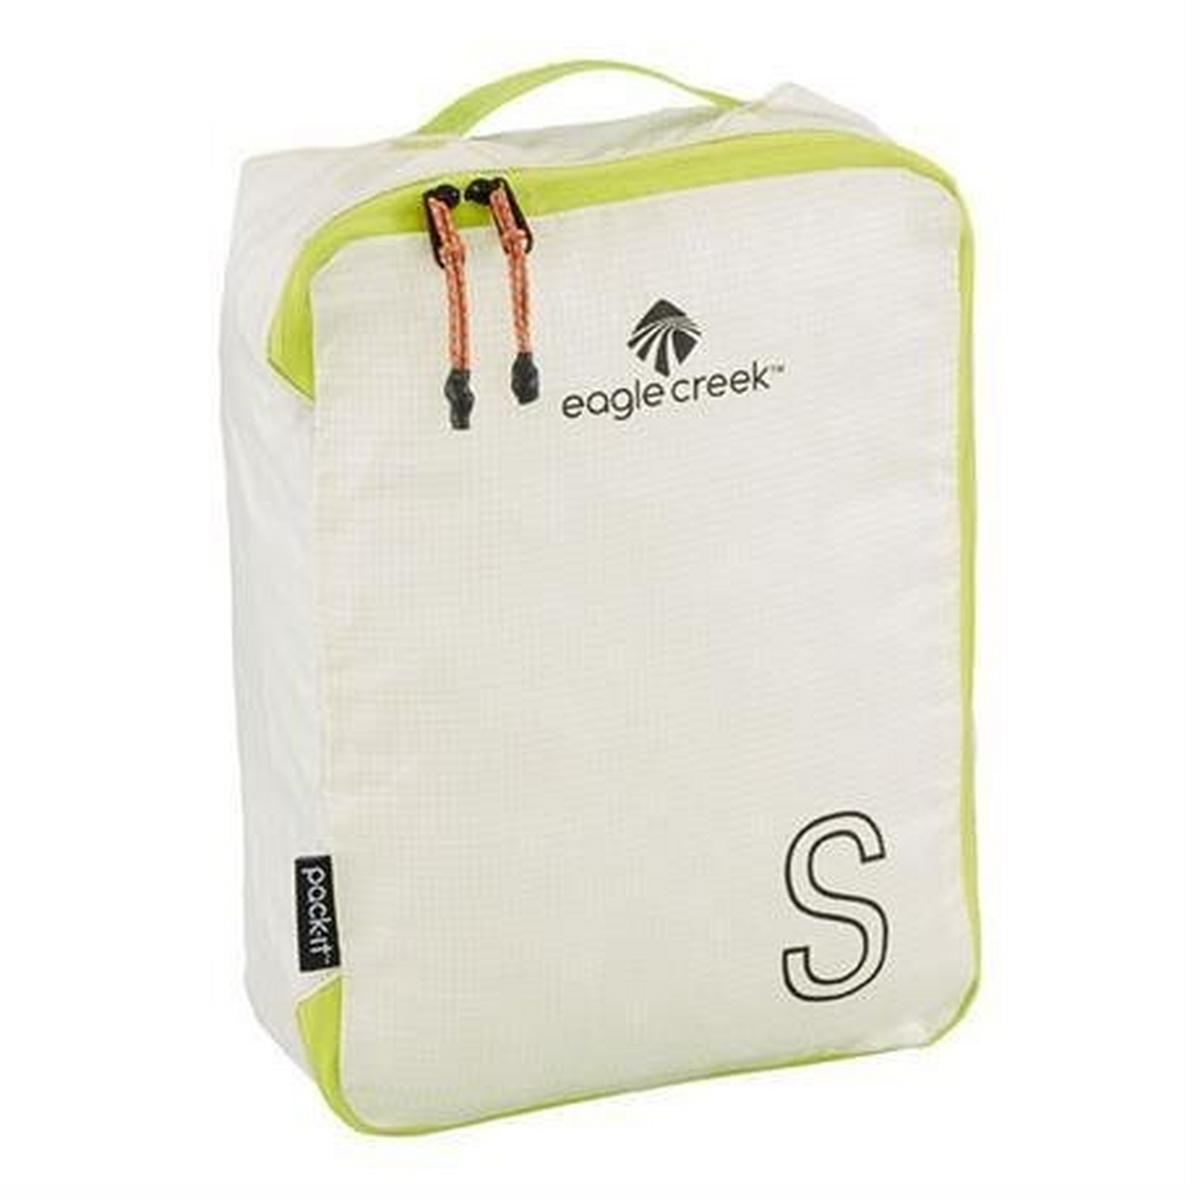 Eagle Creek Travel Lugagge: Pack-It Specter Tech Cube SMALL White/Strobe Green